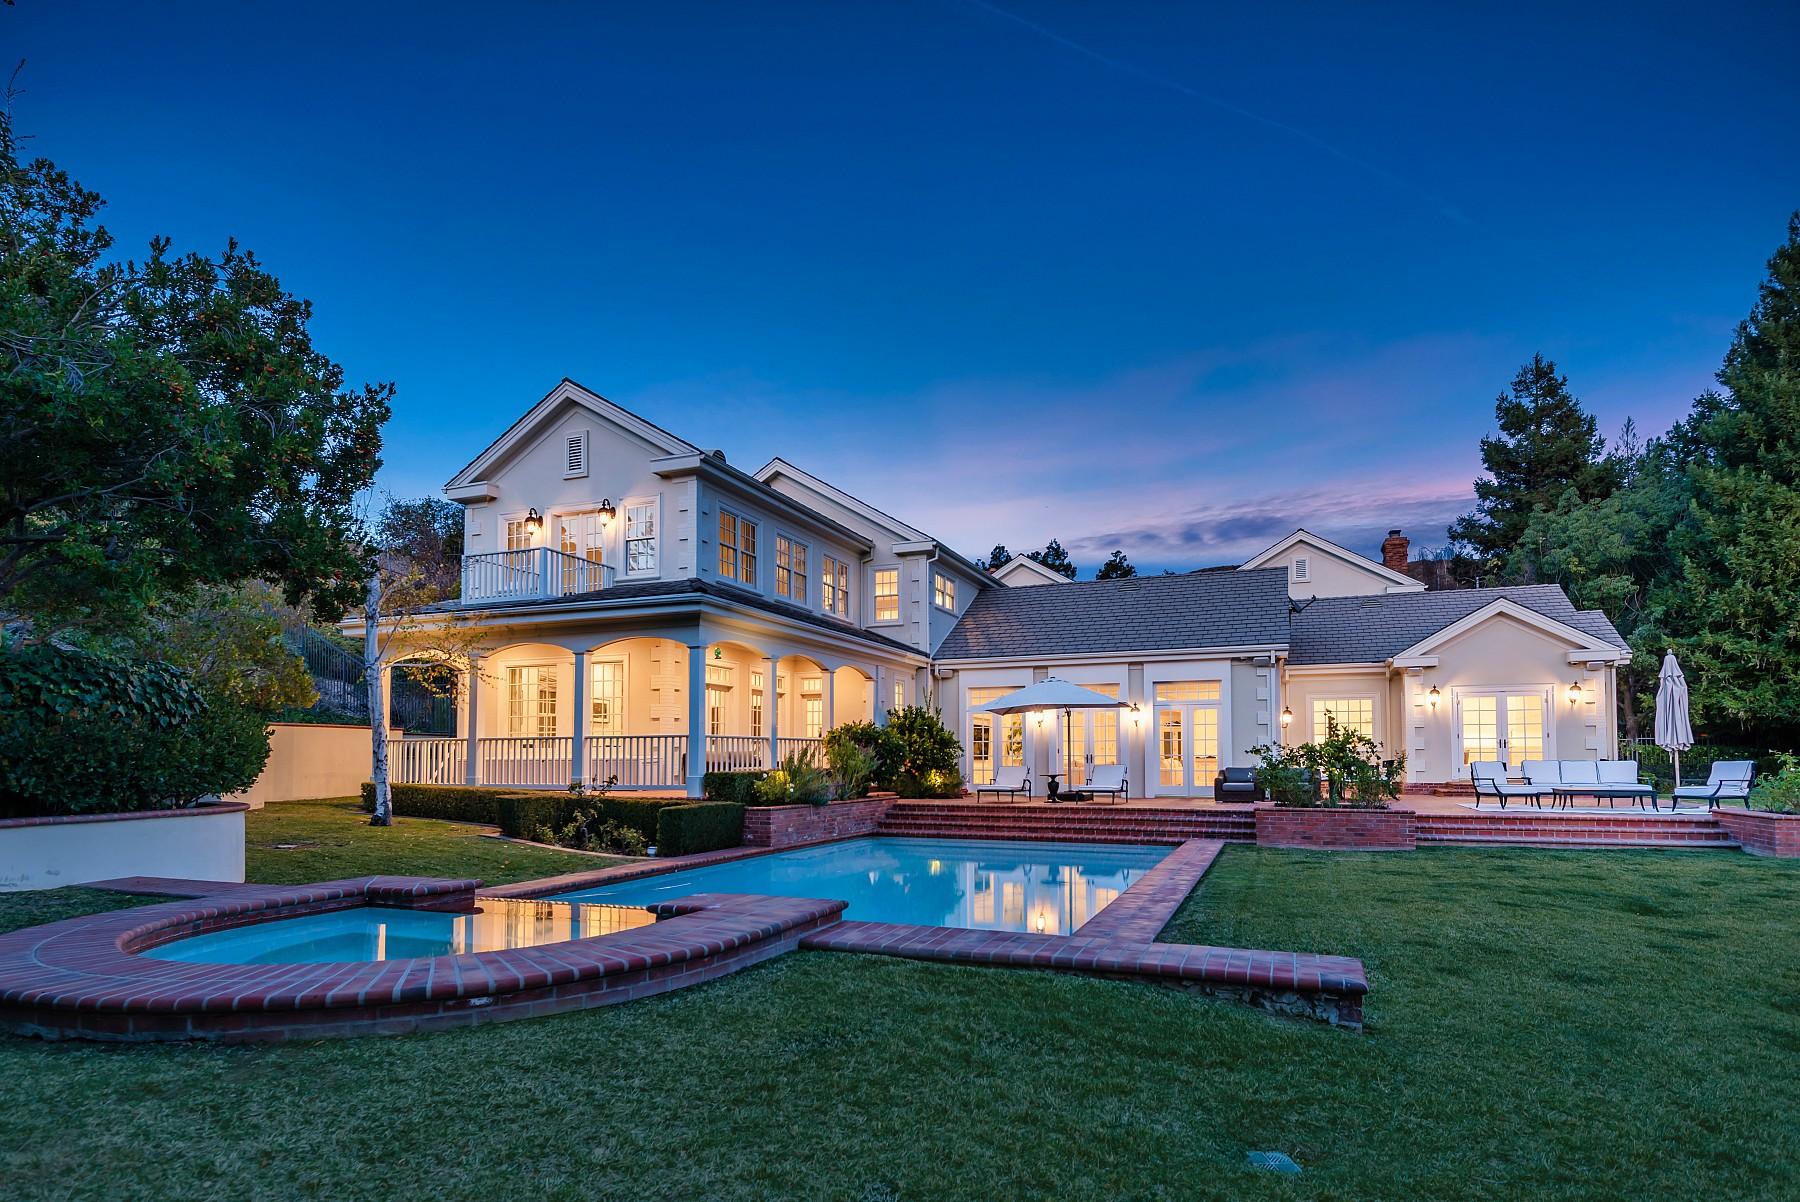 517 Lakeview Canyon Road, Westlake Village, CA 91362